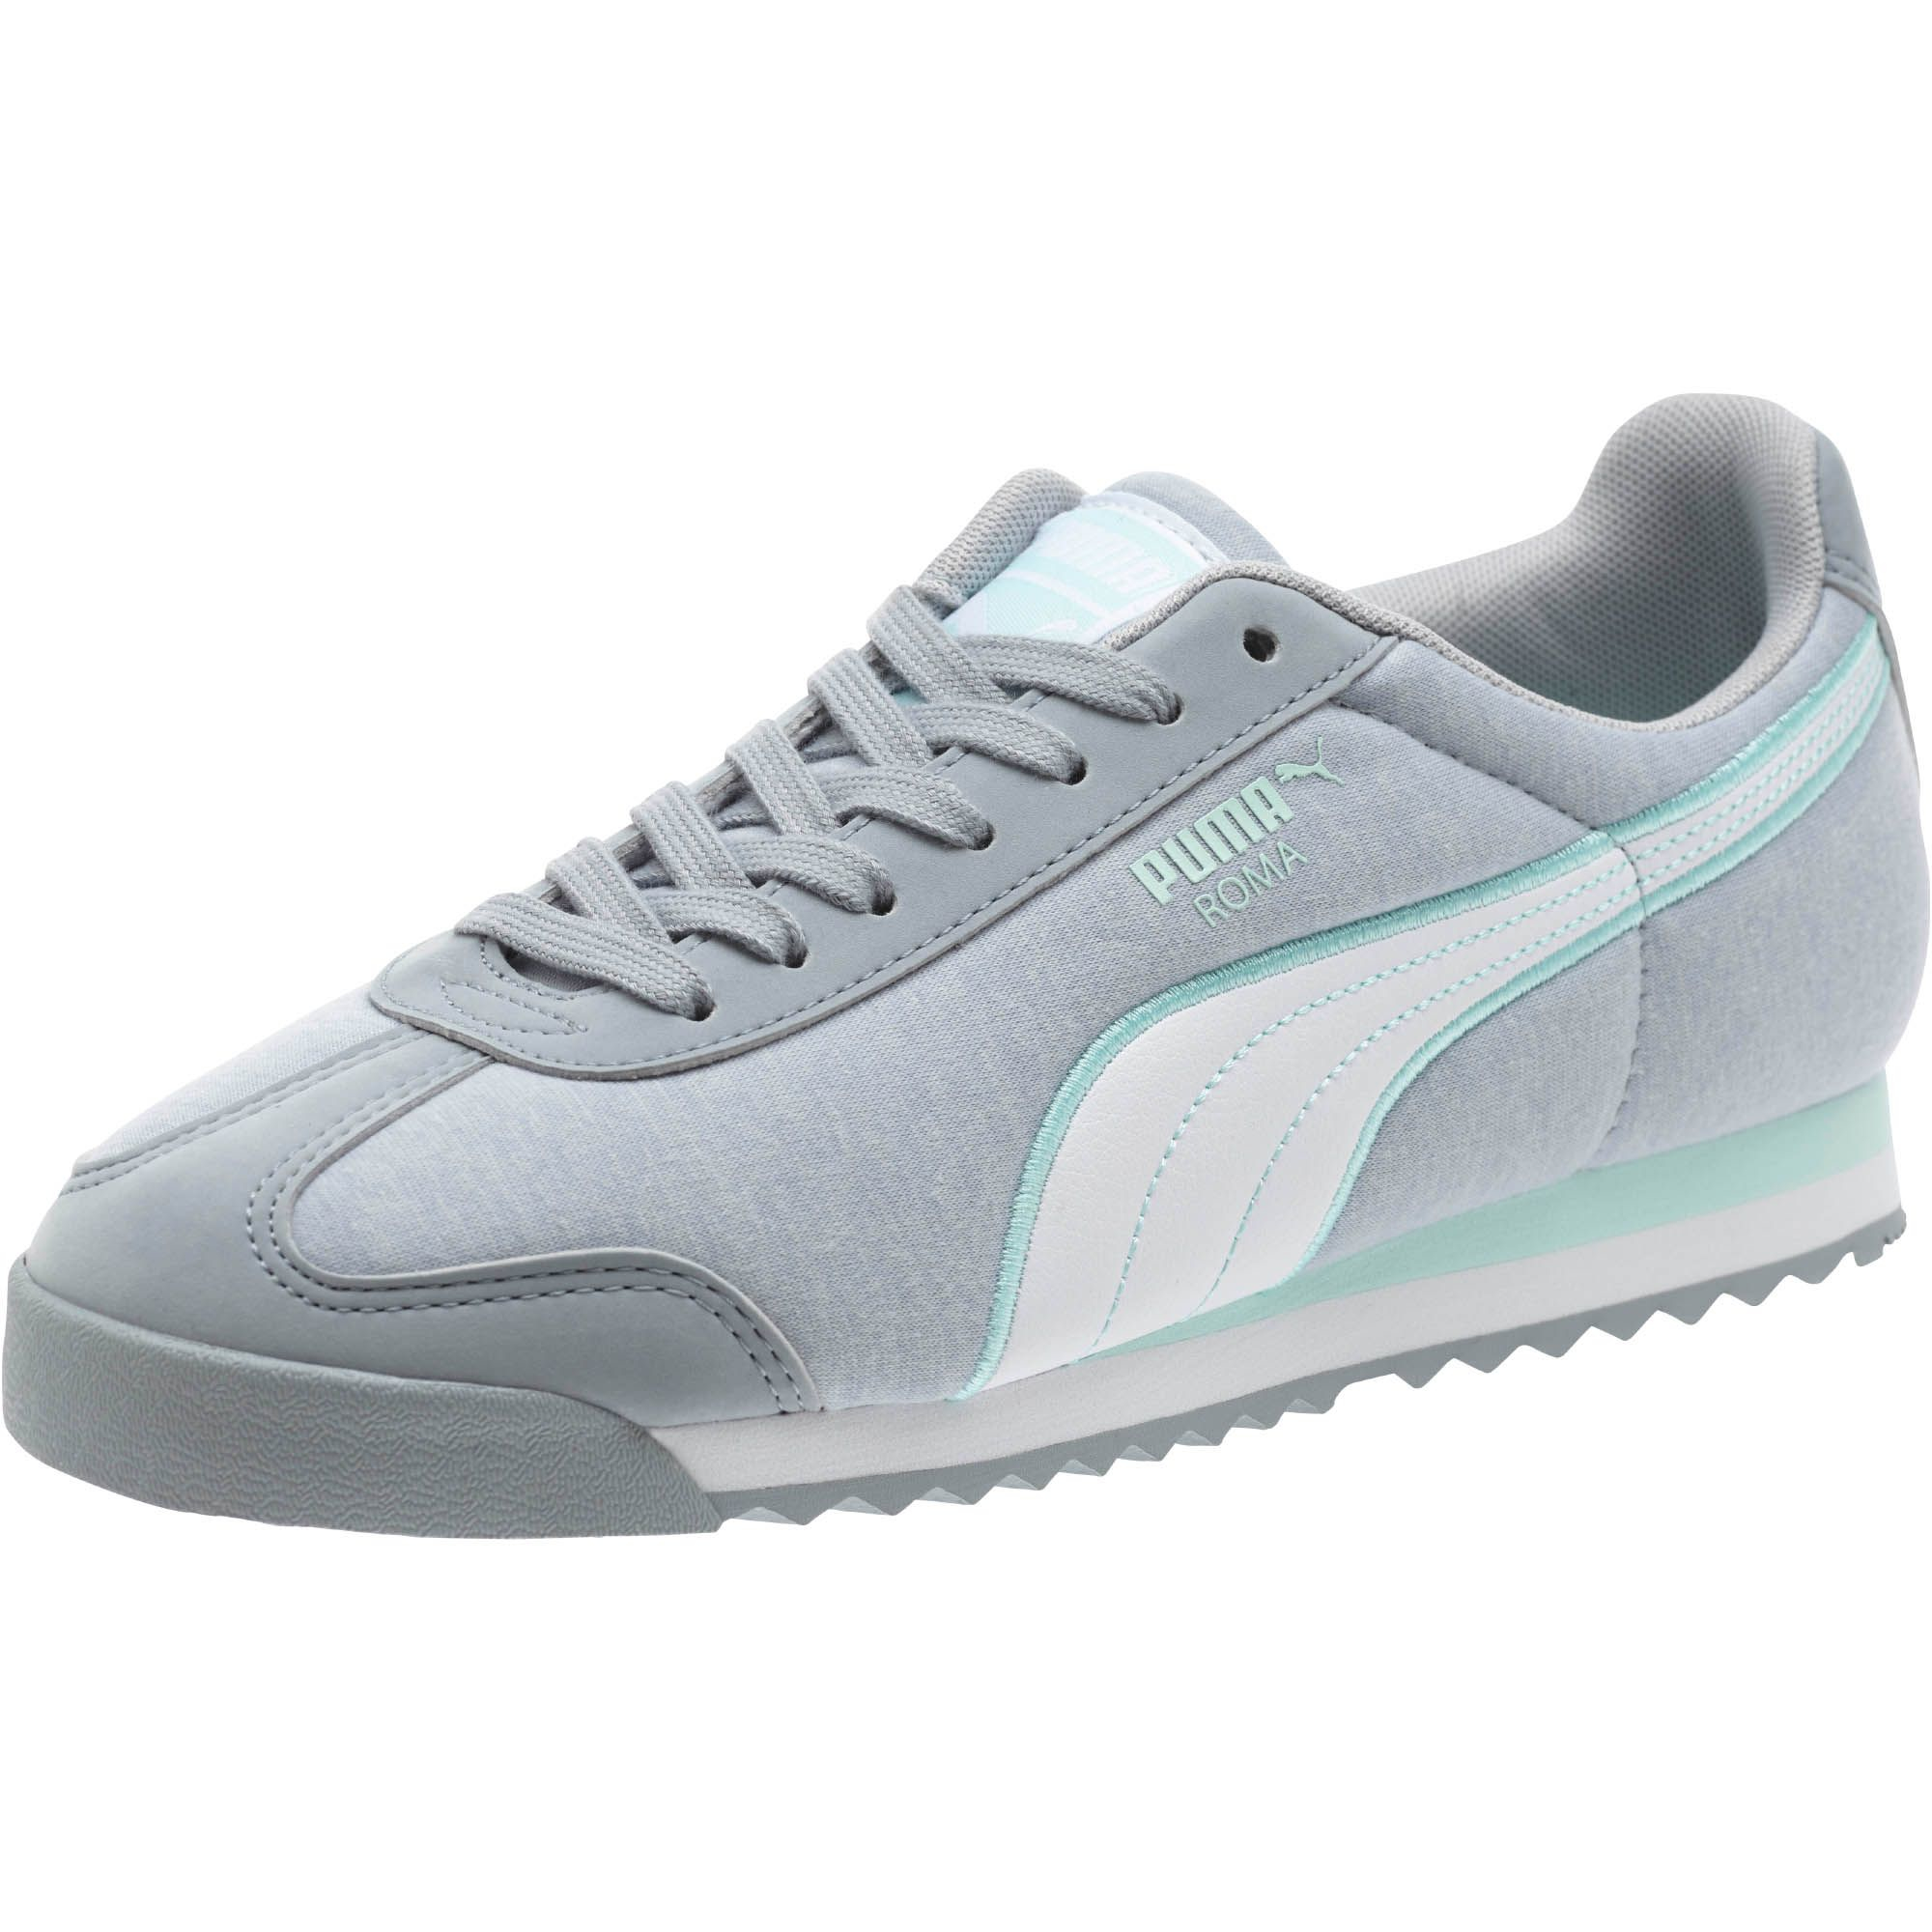 Lyst - PUMA Roma Jersey Women s Sneakers in Brown 89699f2061